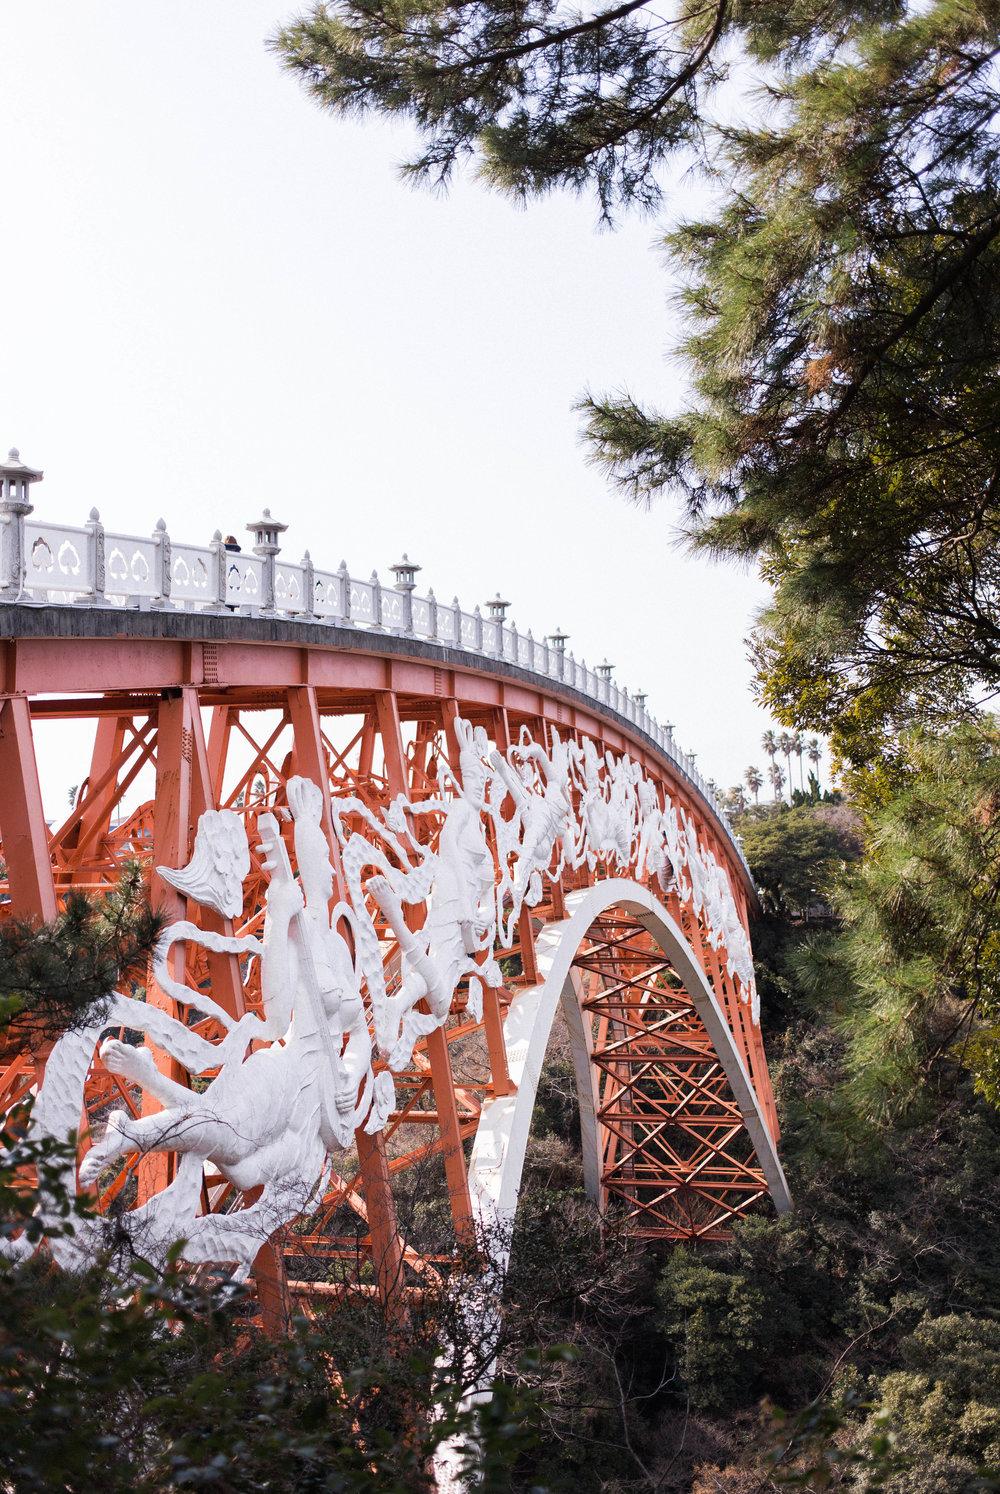 affecionada, Jeju Island, photo travel diary, Cheonjeyeon Falls, Seonimgyo Bridge, Chilseonyeogyo